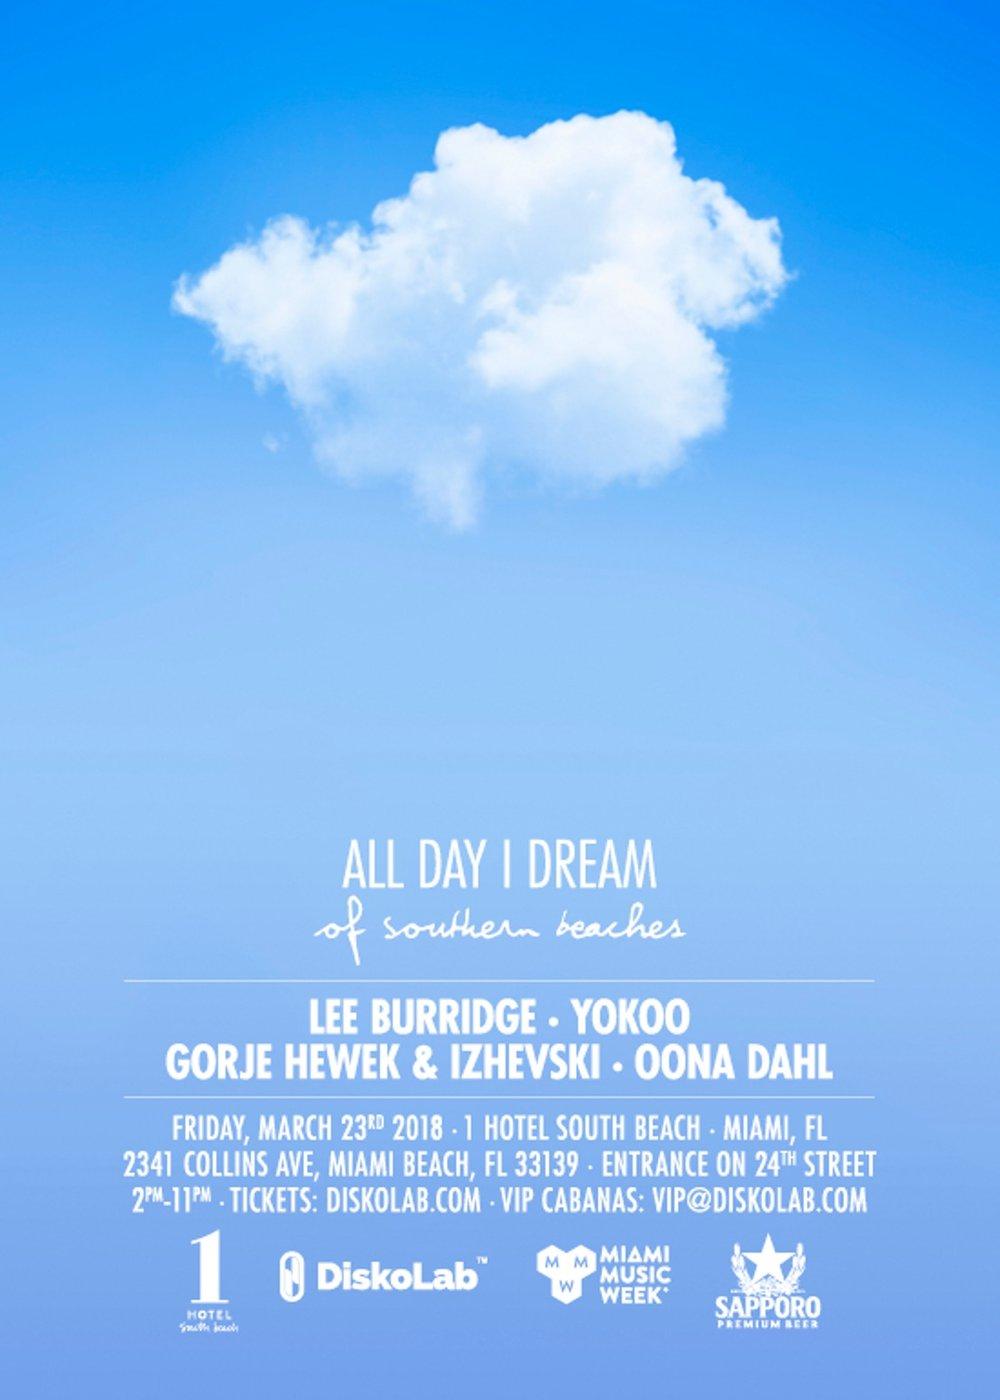 All Day I Dream MMW 2018 - lineup Announcement.jpg